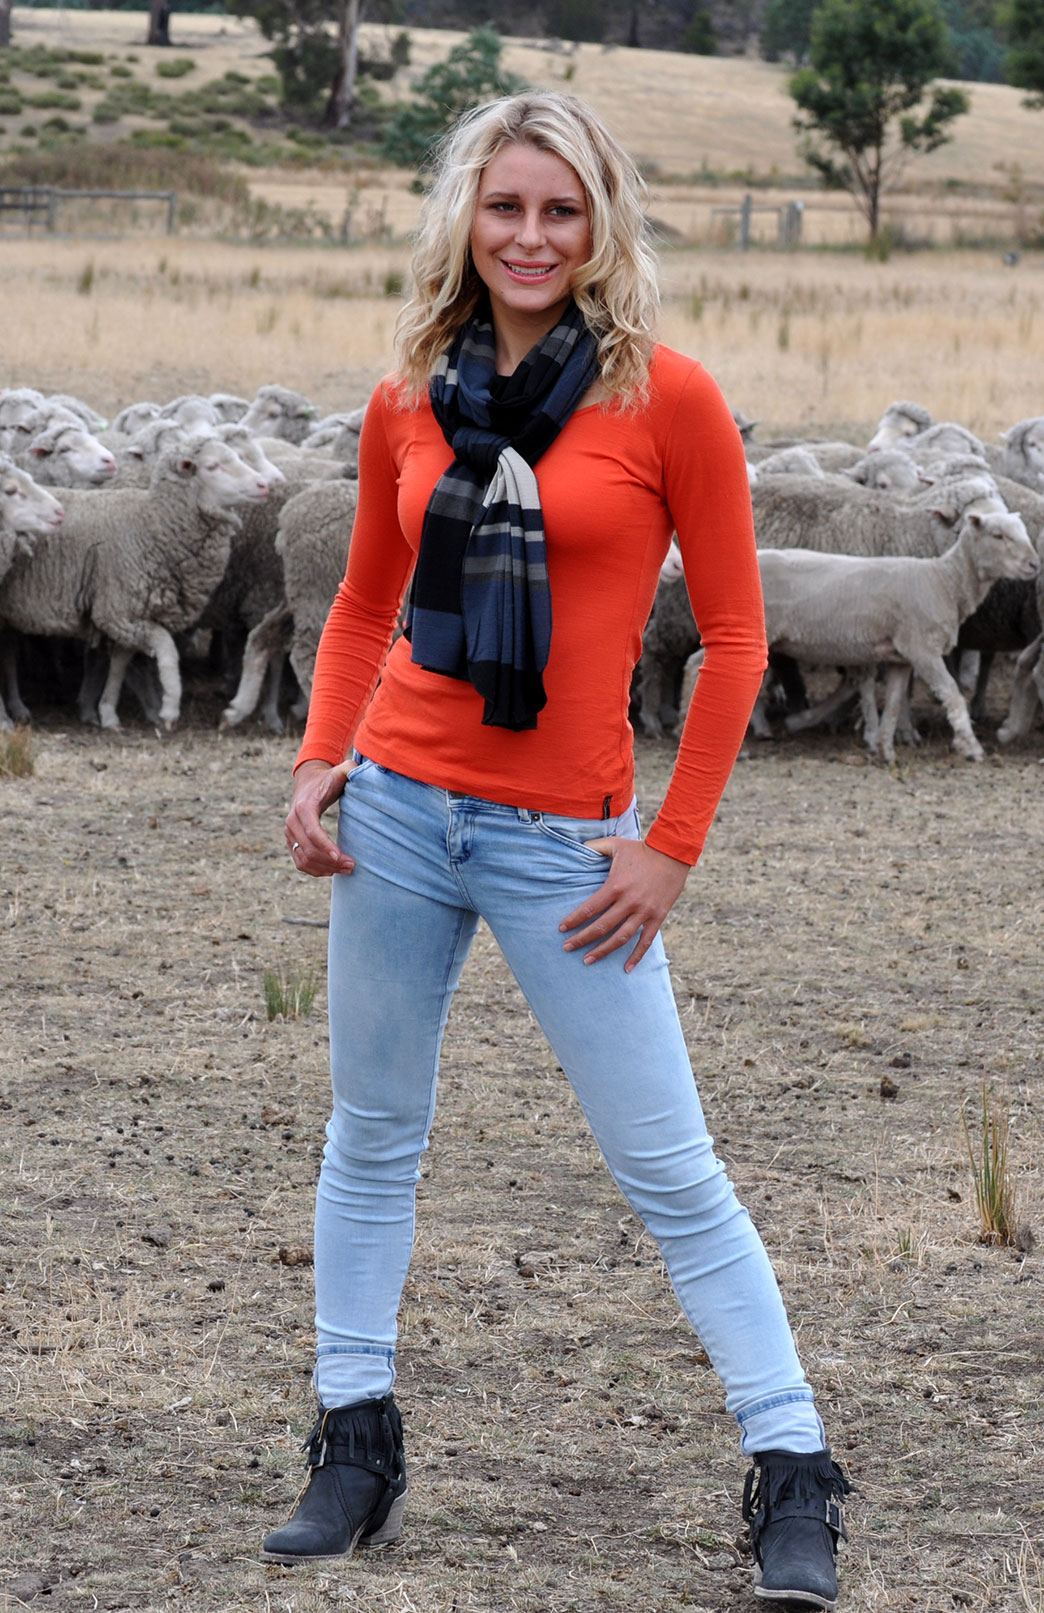 Scoop Neck Top - Plain - Women's Paprika Orange Pure Merino Wool Long Sleeved Layering Top with Scoop Neckline - Smitten Merino Tasmania Australia